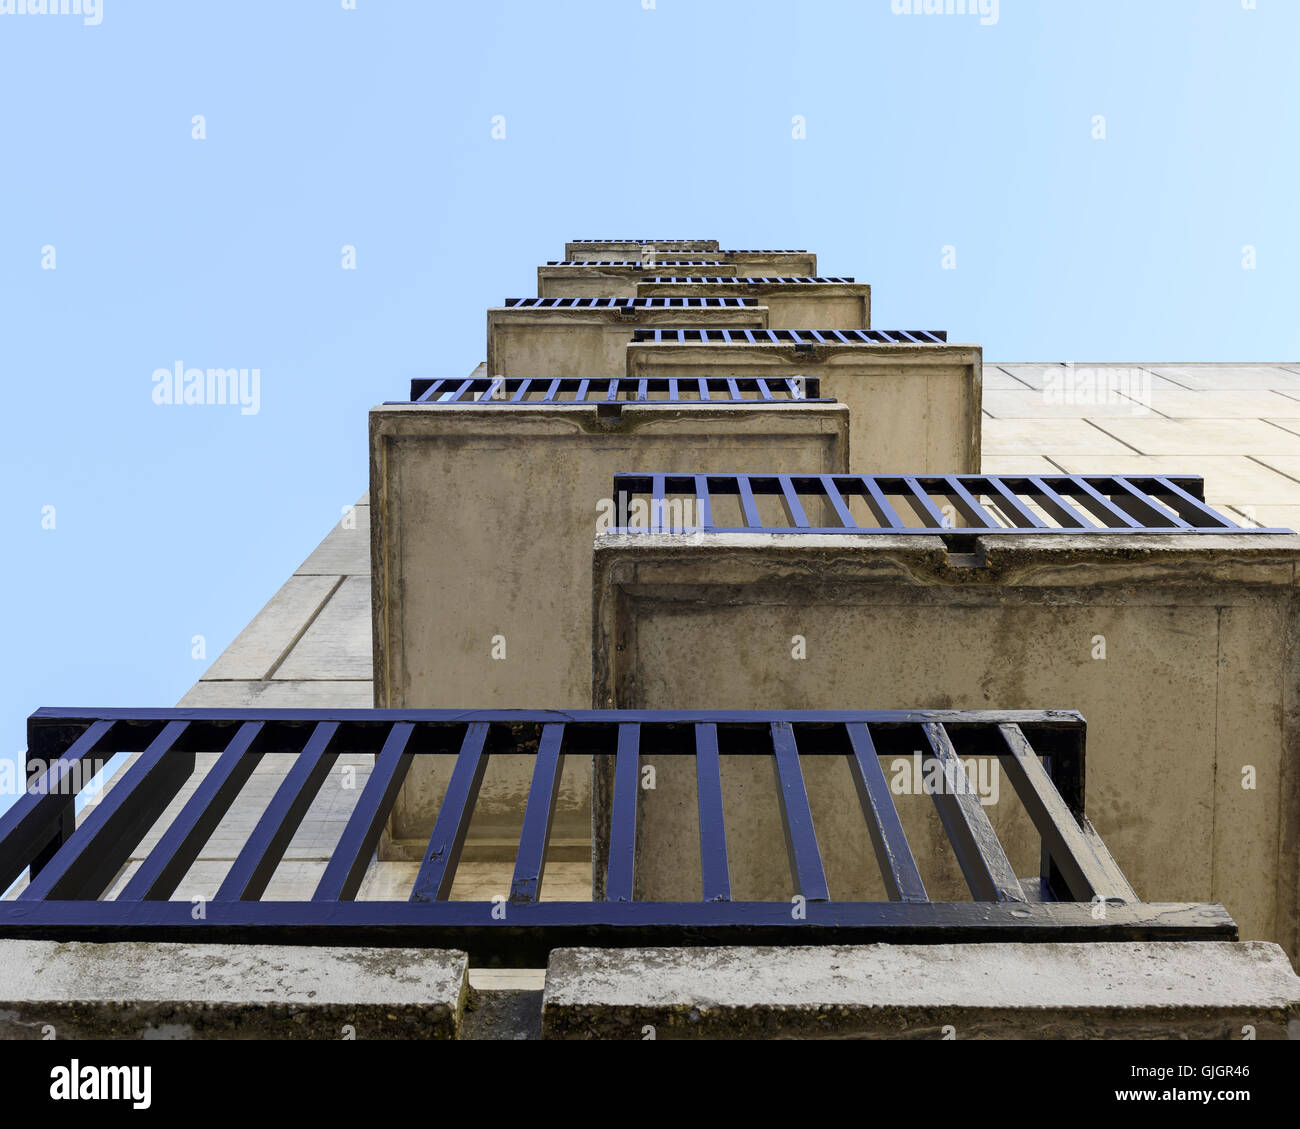 Balconies. Flaine, Flaine, France. Architect: Marcel Breuer, 1969. Stock Photo